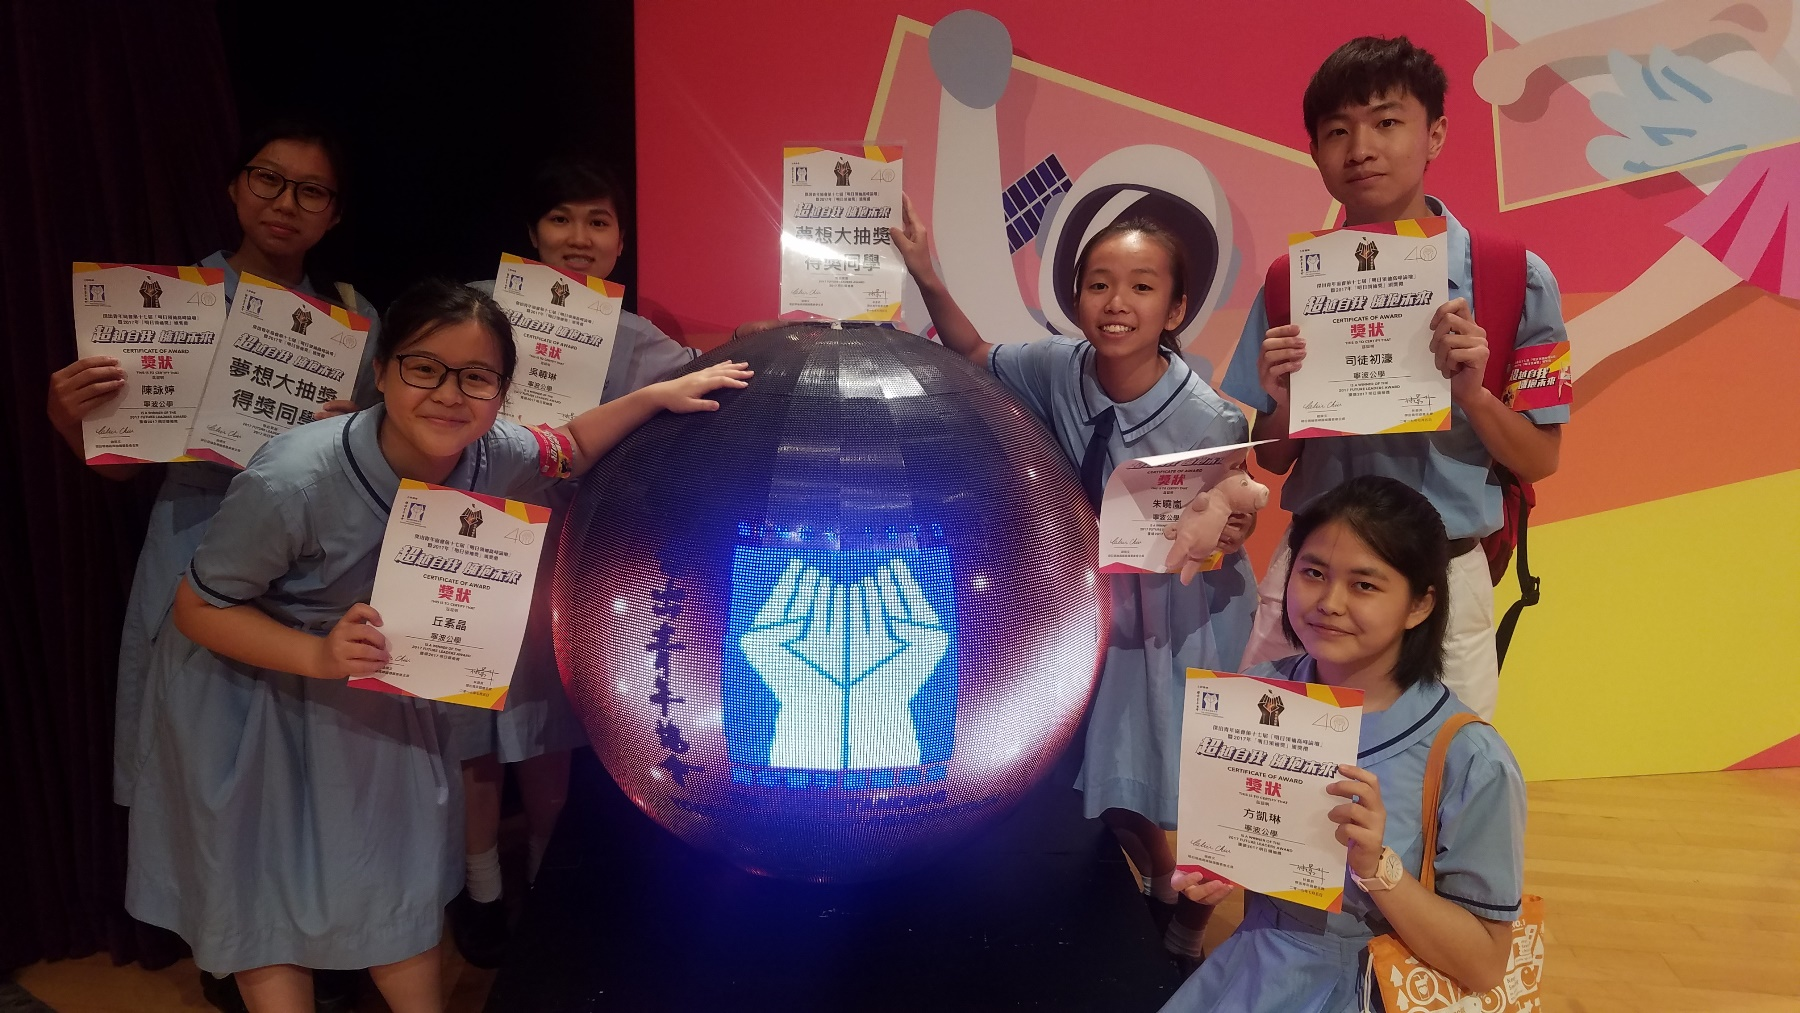 http://www.npc.edu.hk/sites/default/files/20170705_171958.jpg